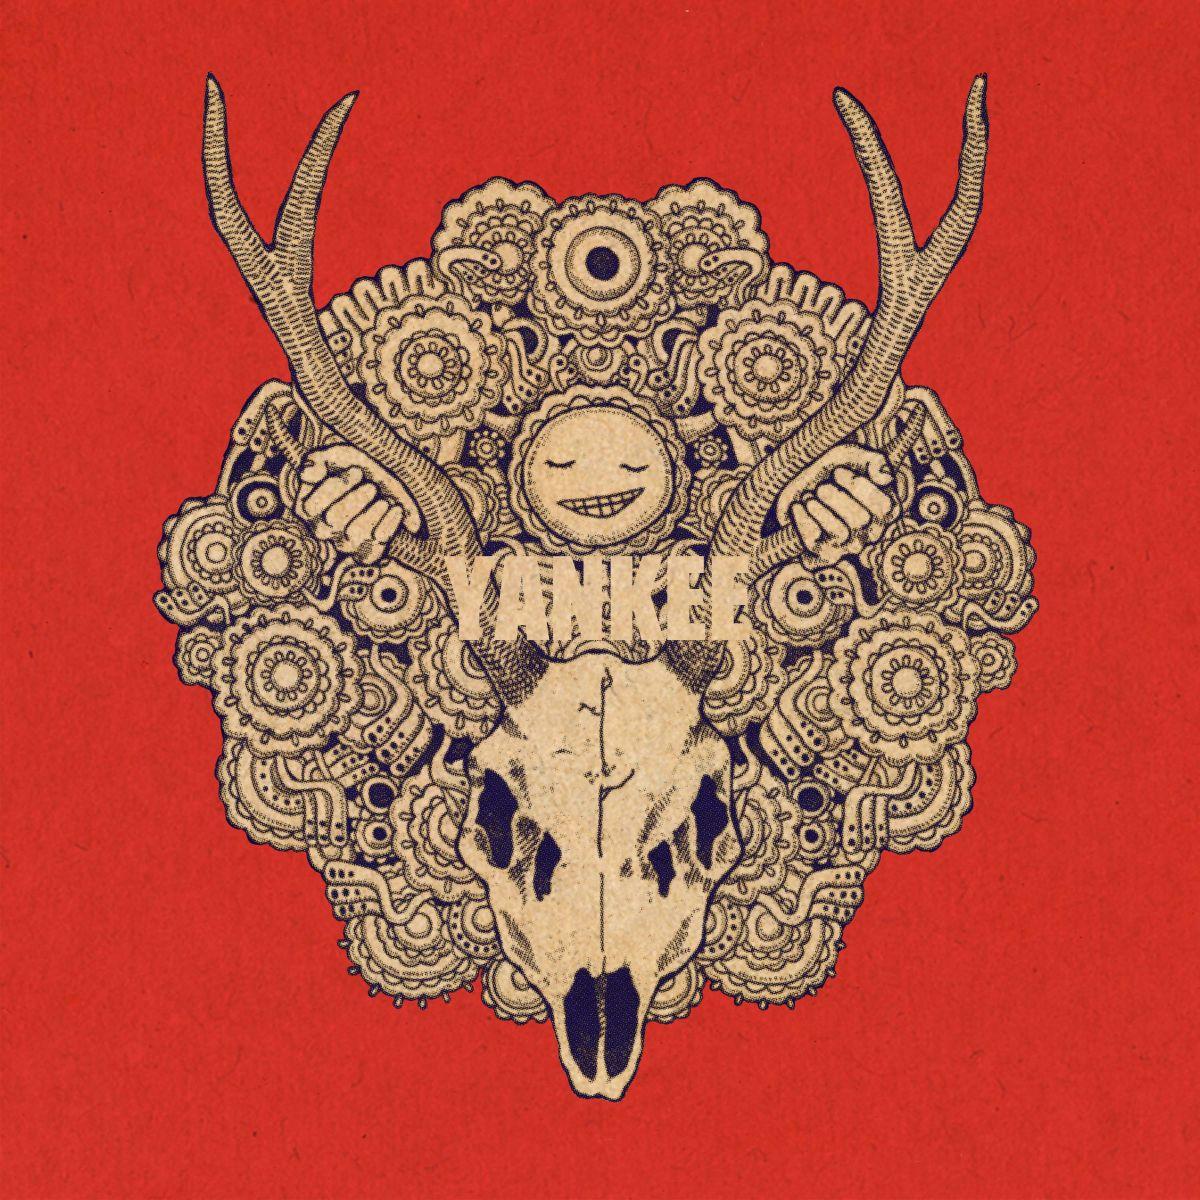 YANKEE(初回限定盤映像盤CD+DVD)[米津玄師]